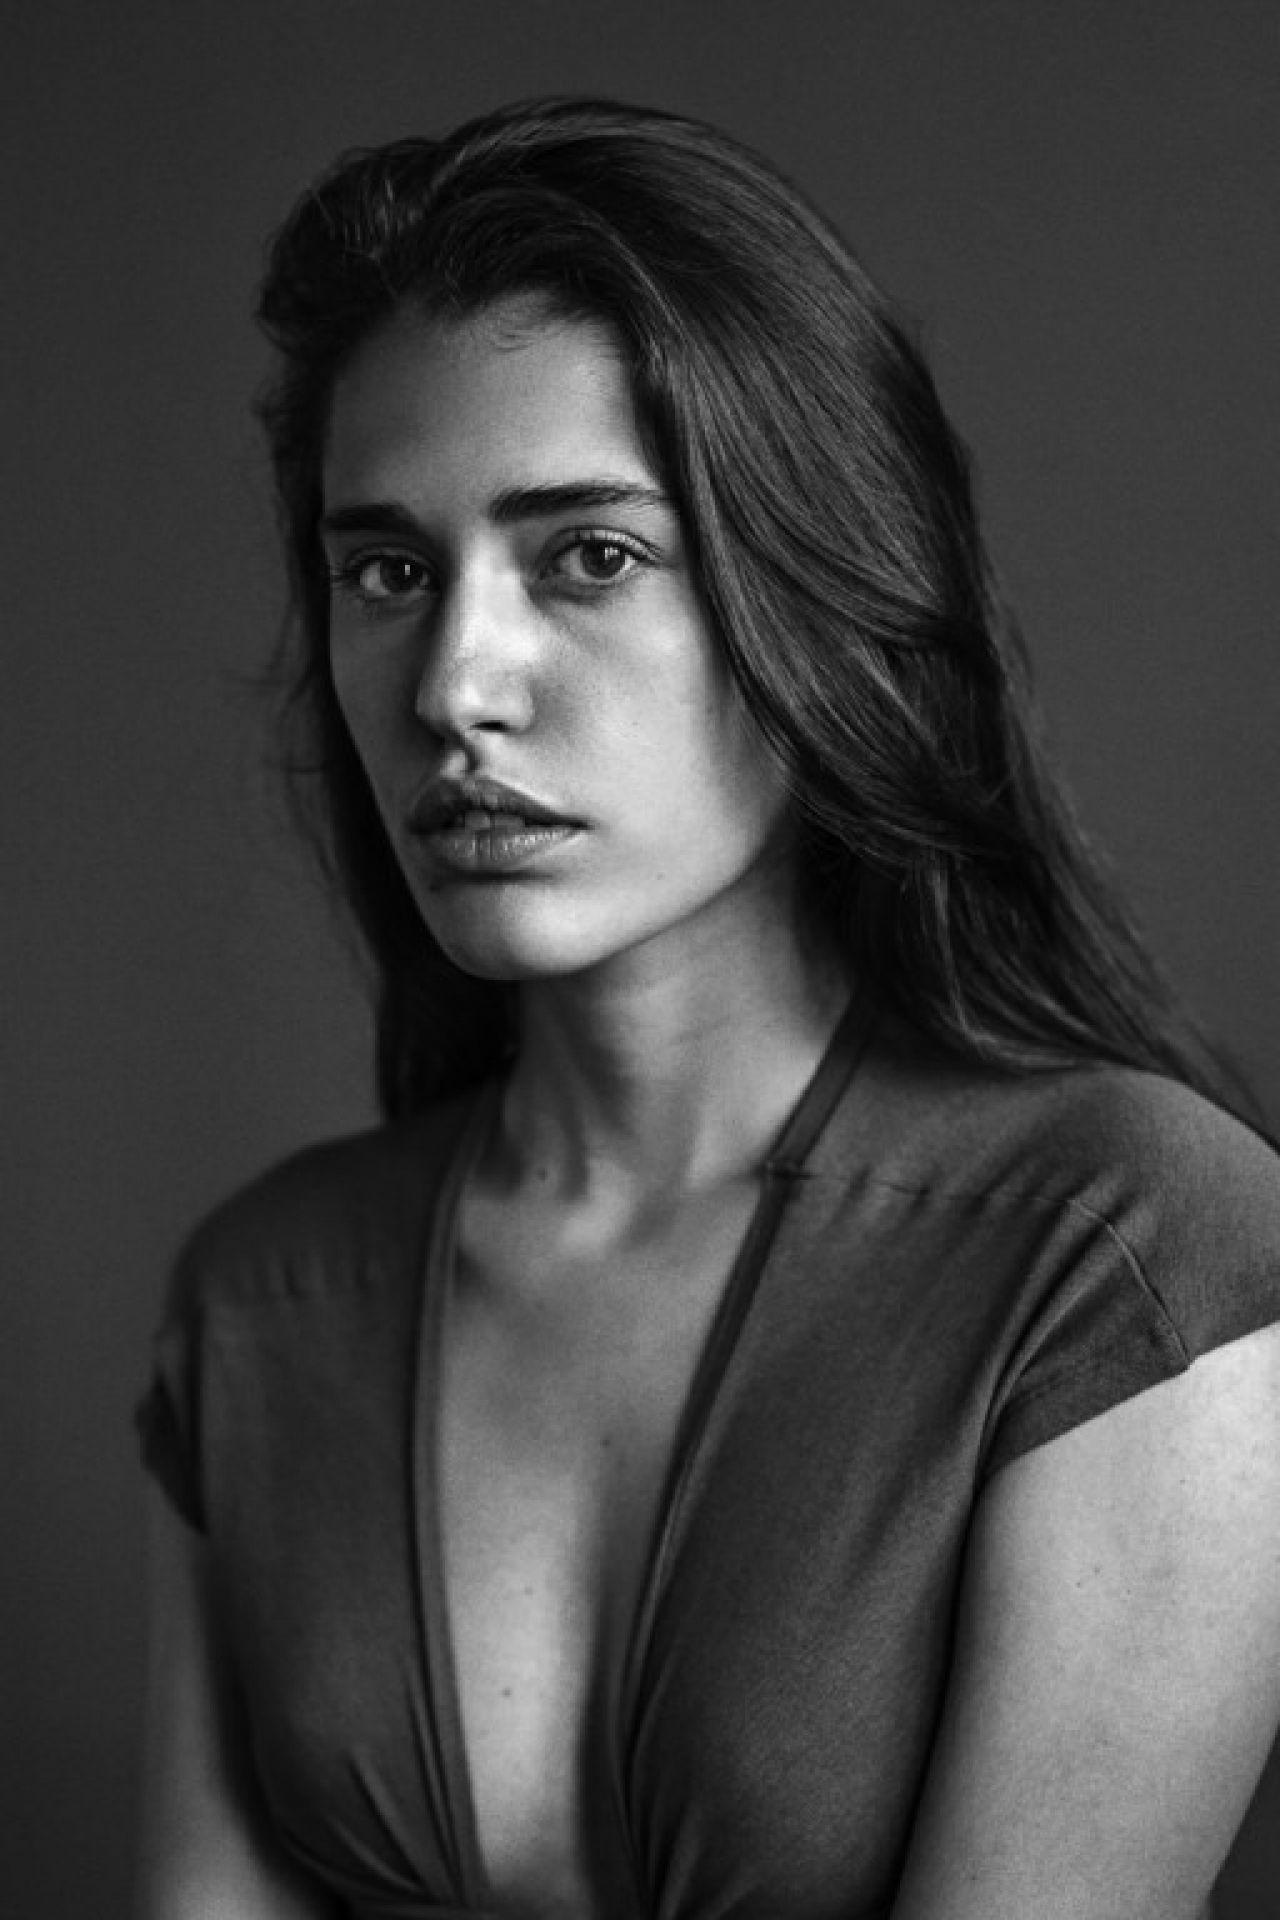 Daphne Morelli